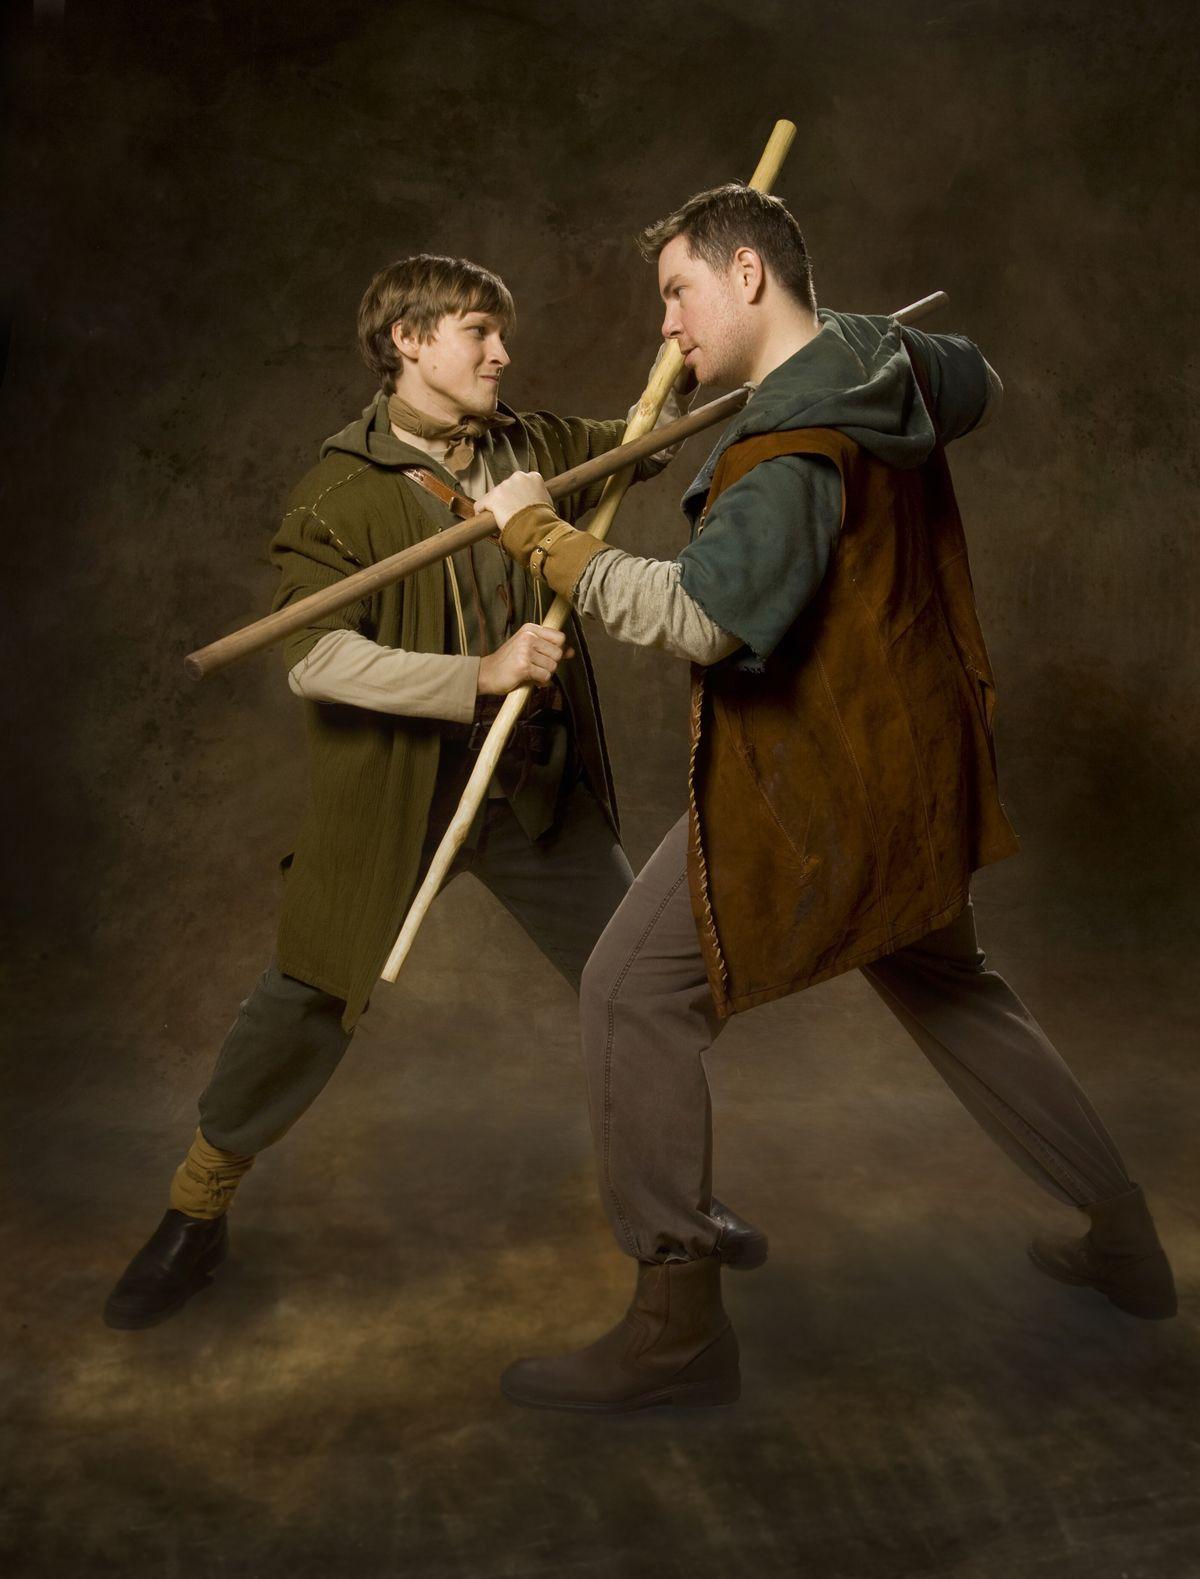 Staff Fighting Weapons Celta